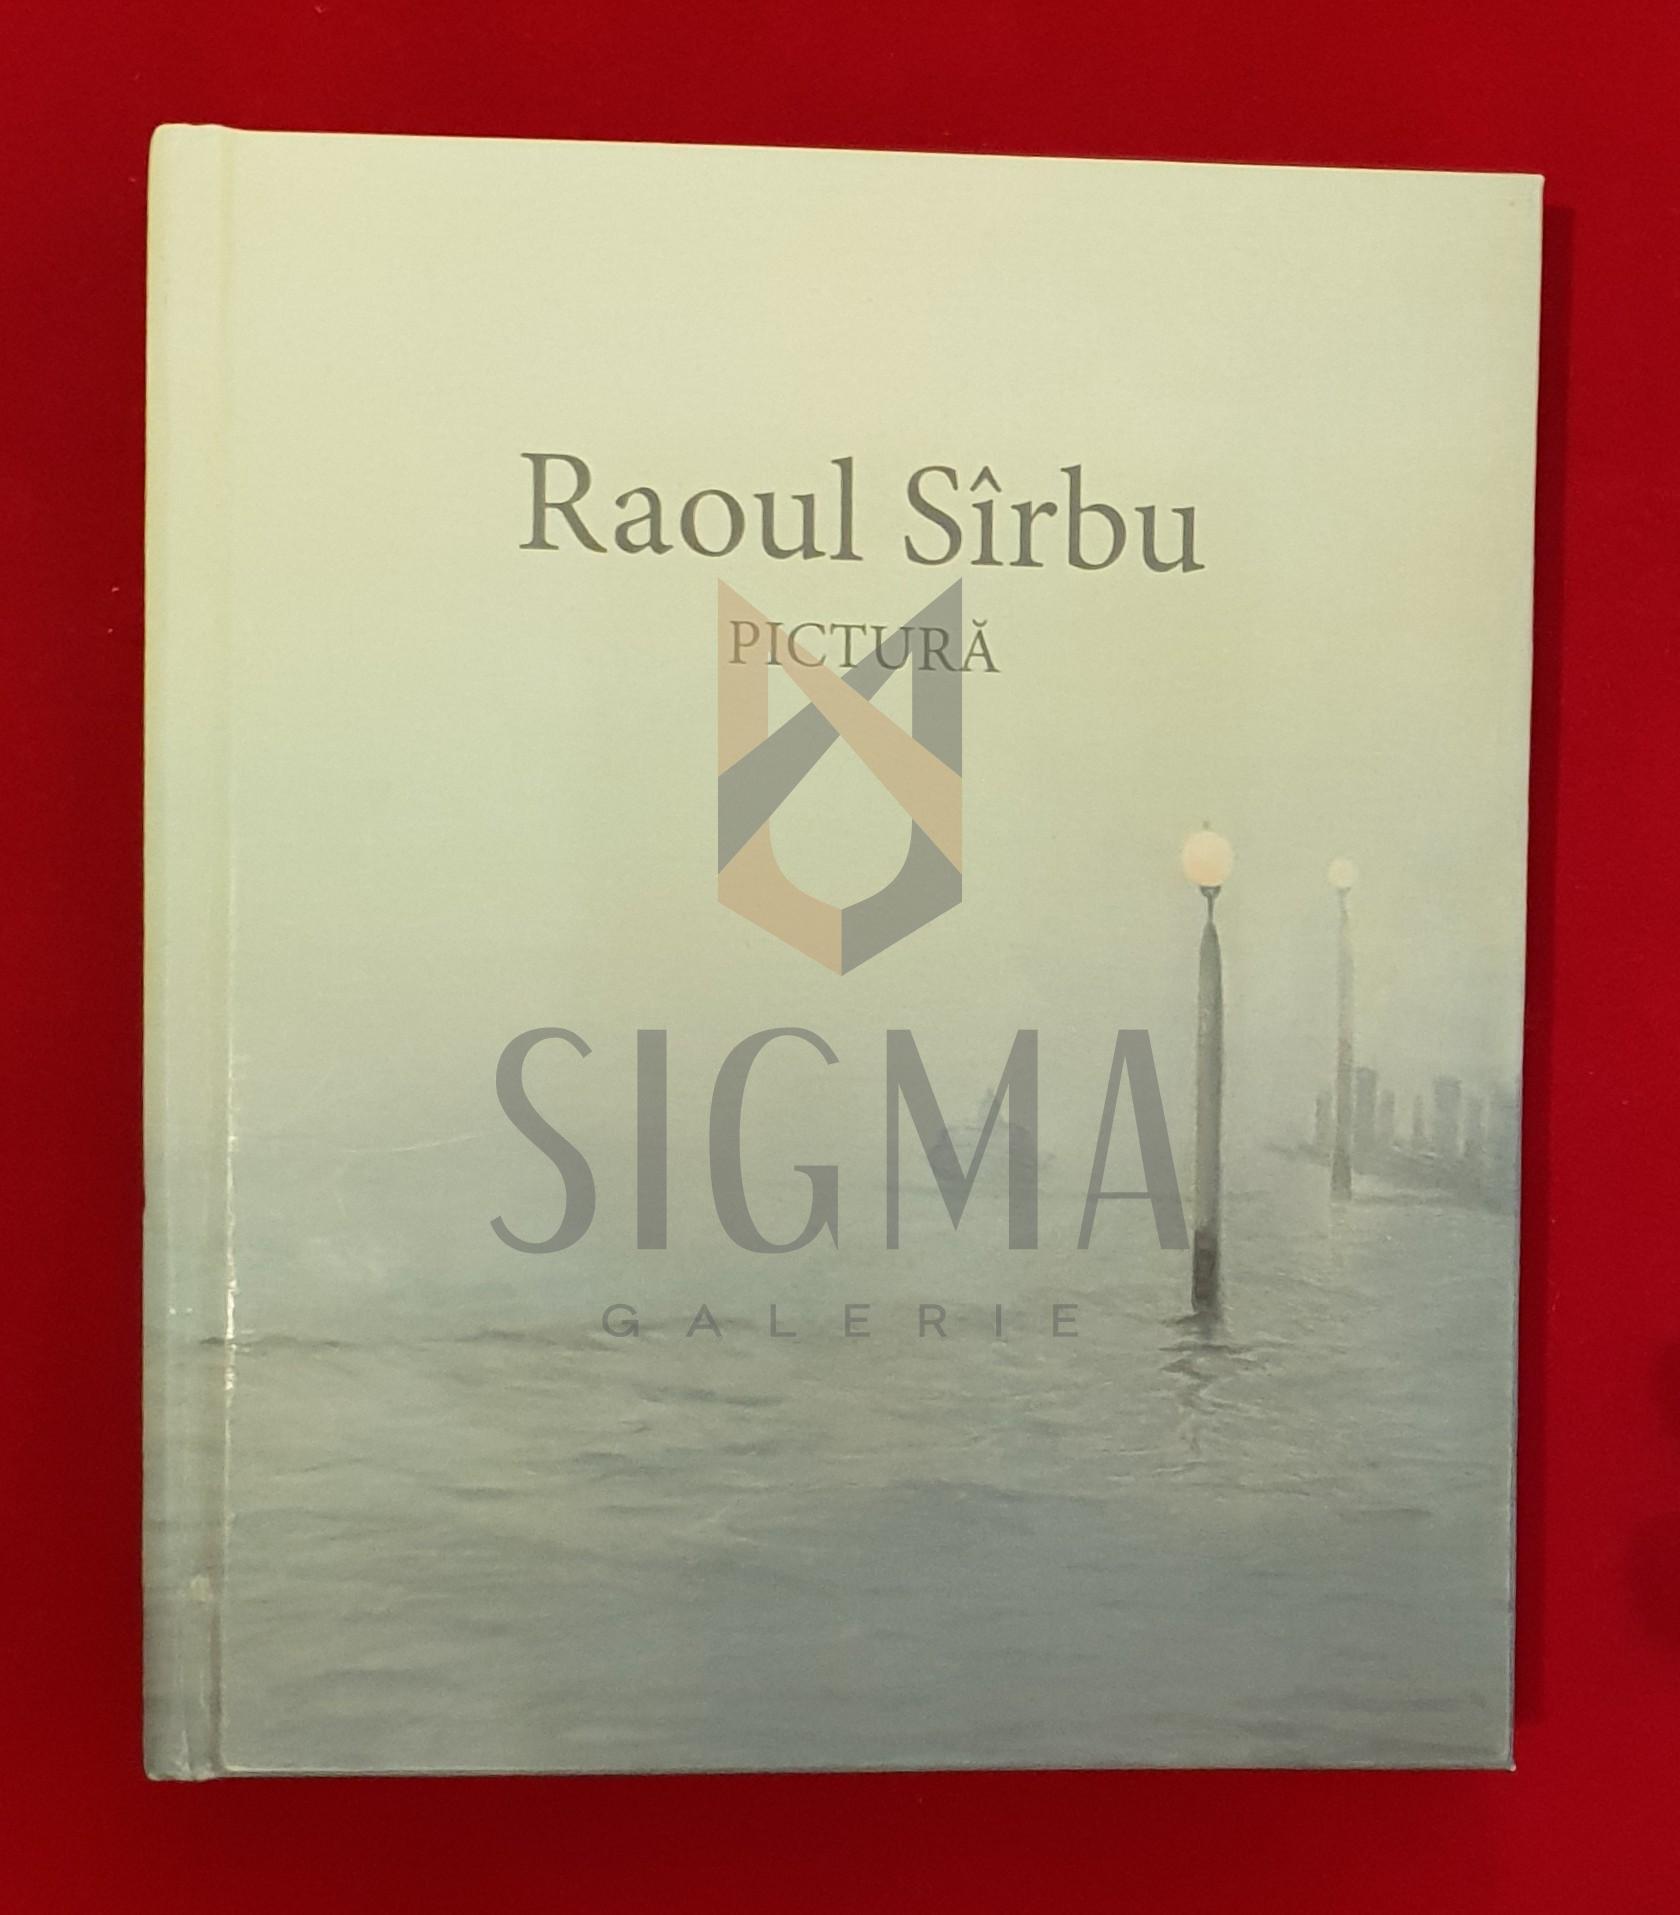 Raoul Sirbu * Pictura